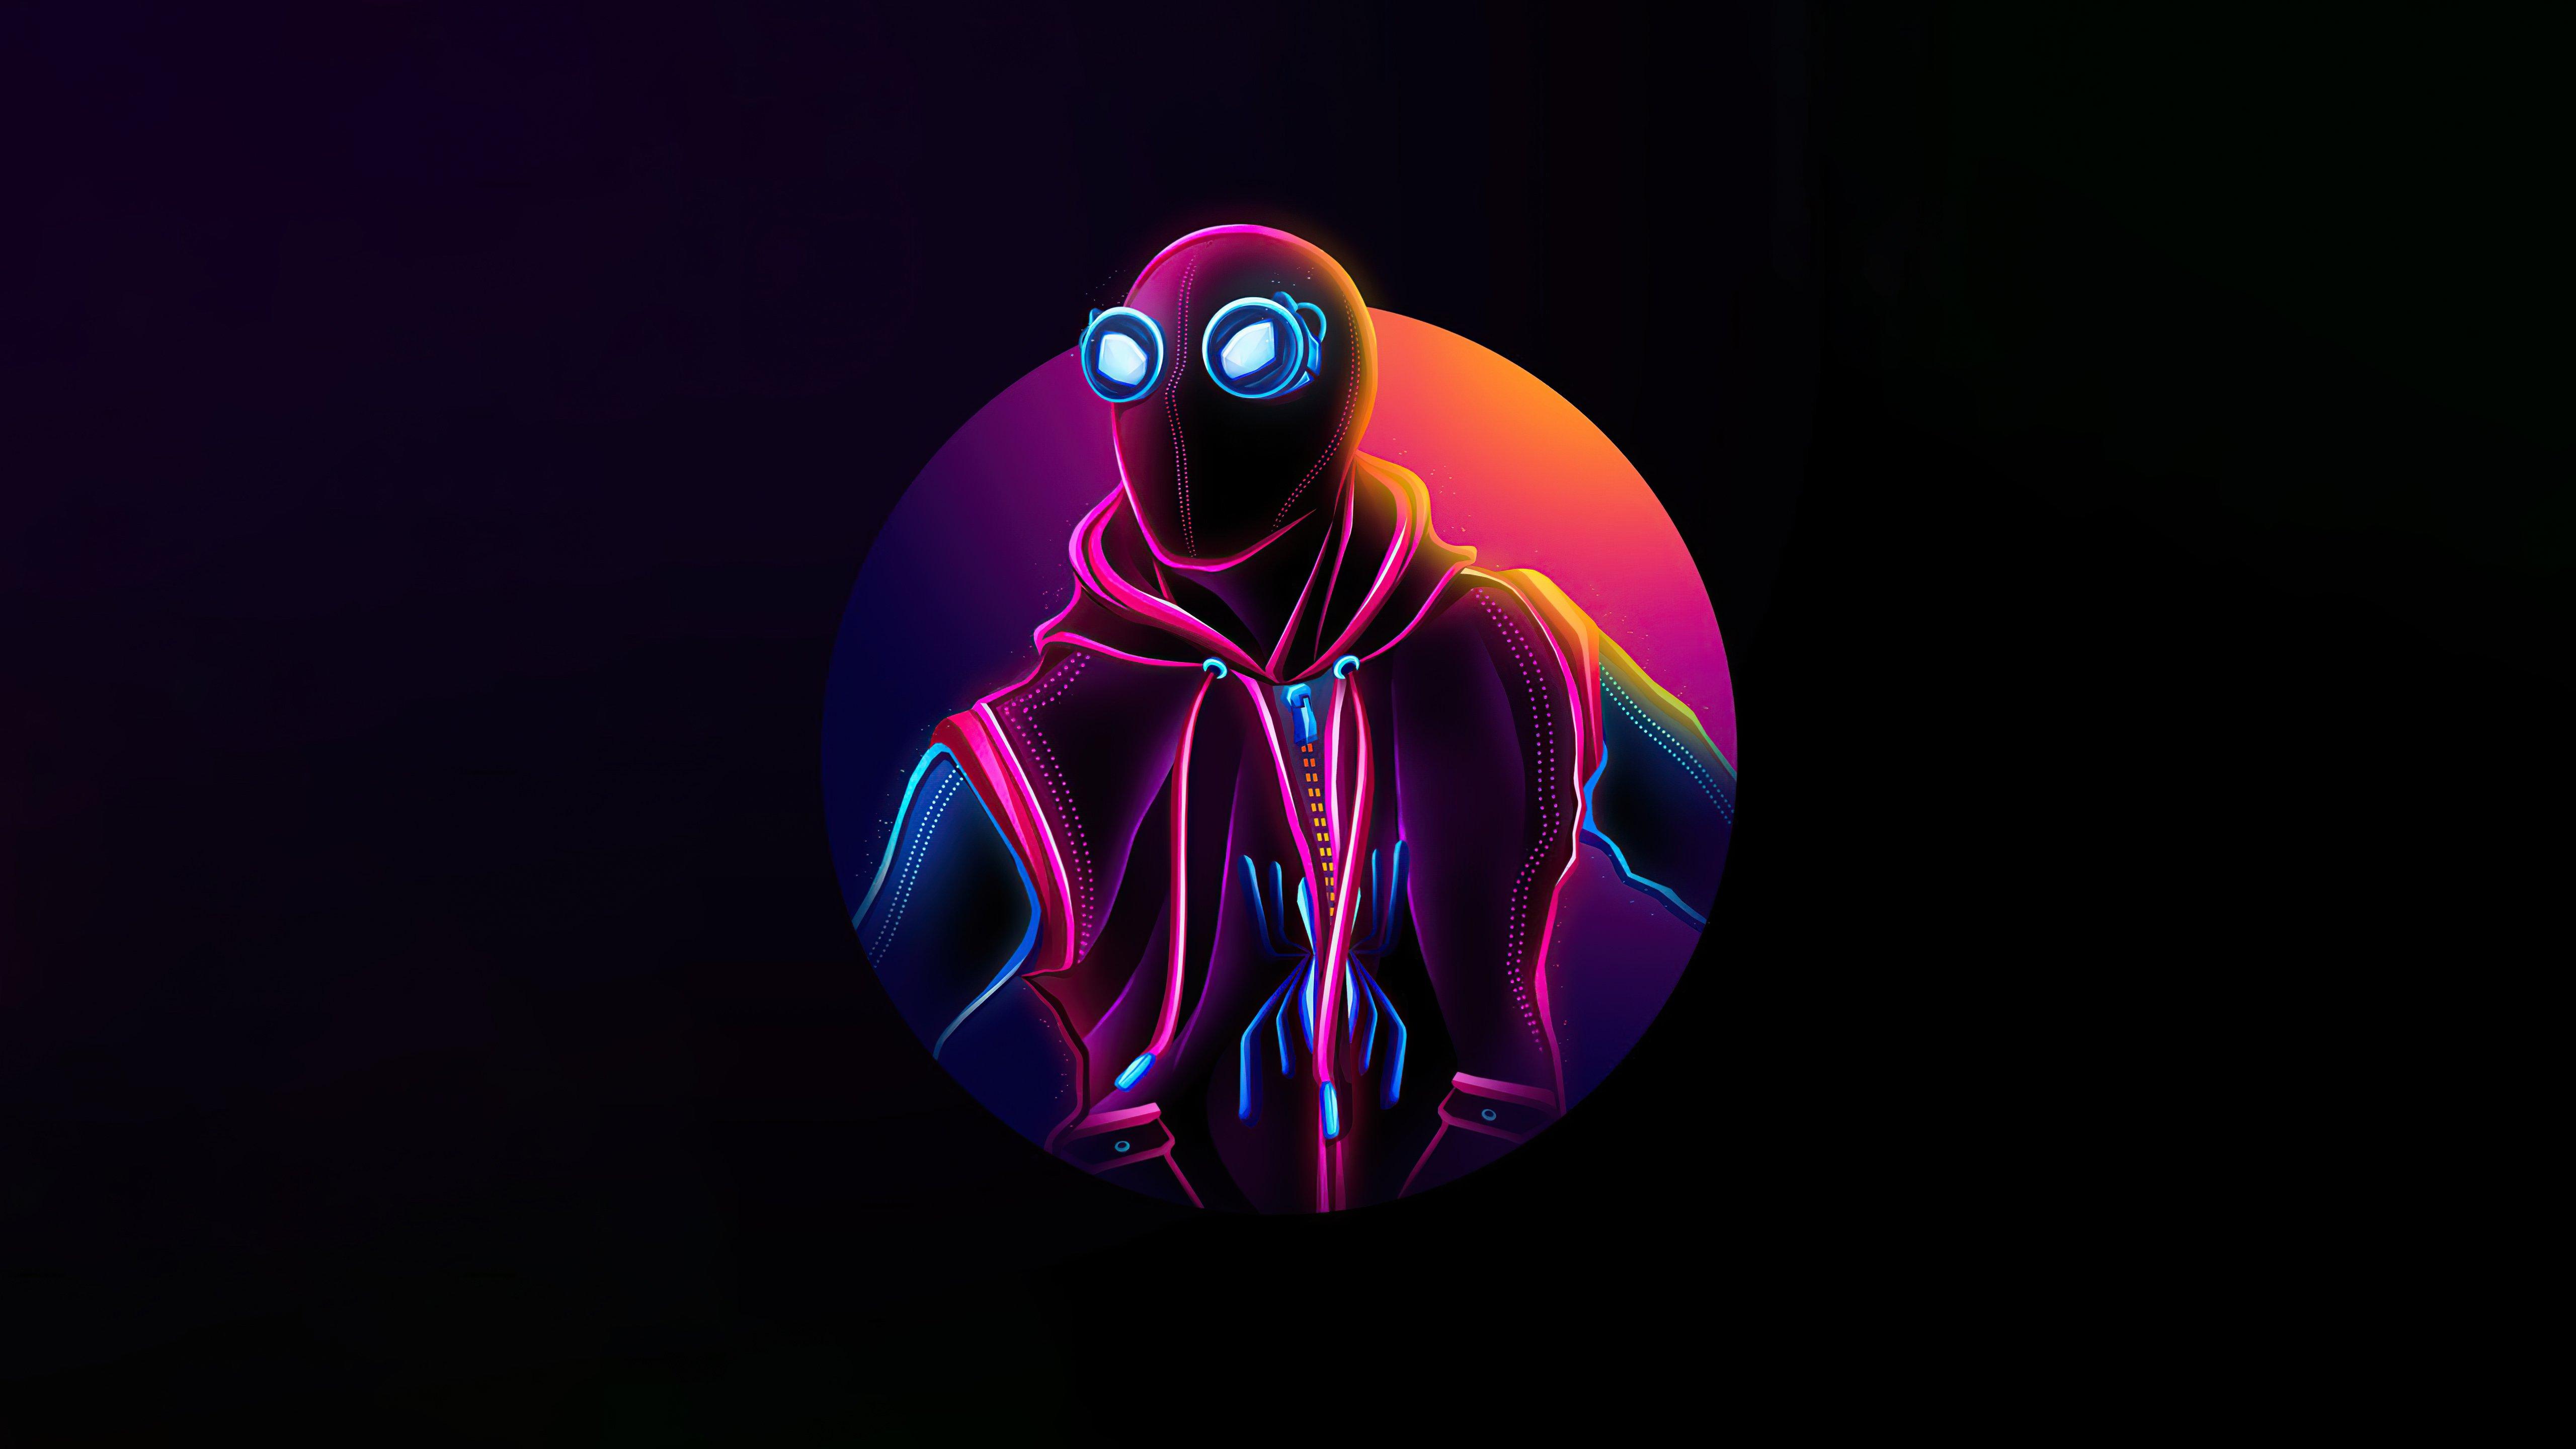 Wallpaper Spider Man Homemade suit Neon